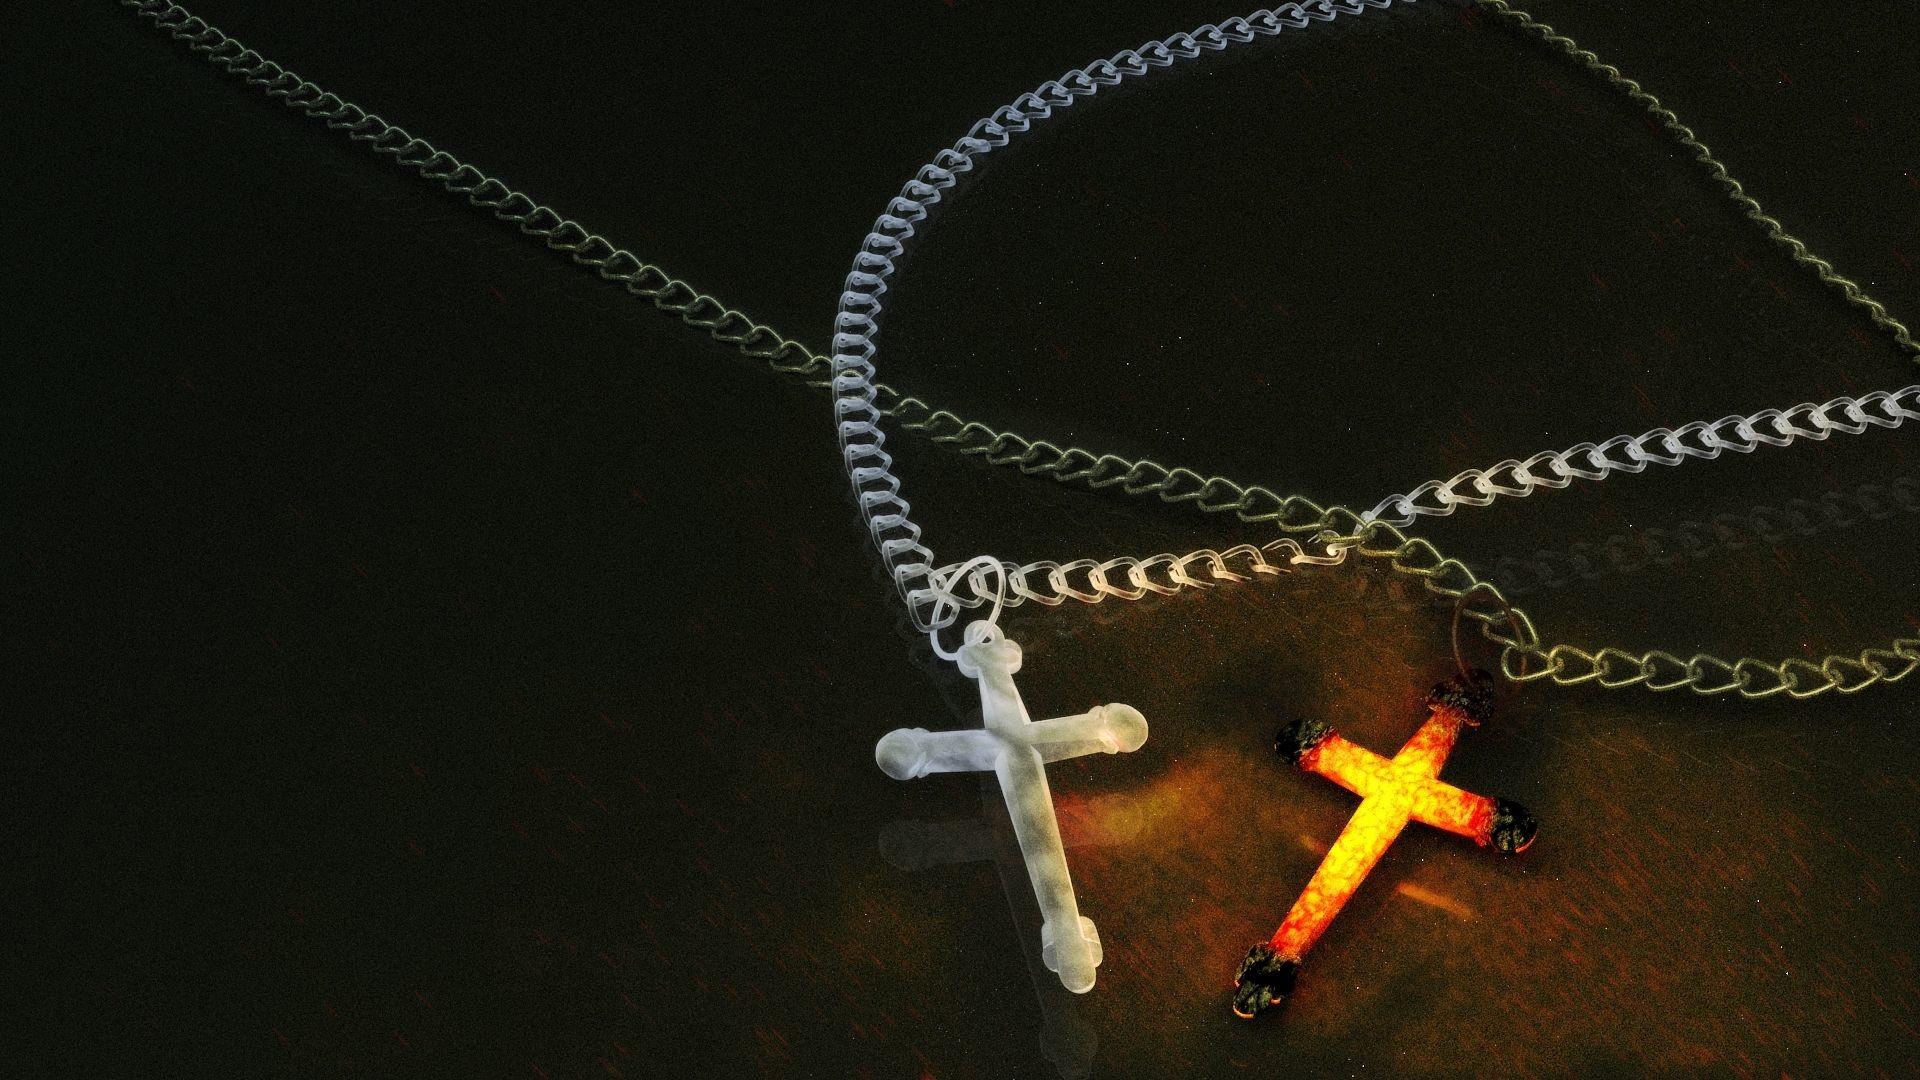 Res: 1920x1080, Crucifix Photo Free Download by Evgeni Bernardini